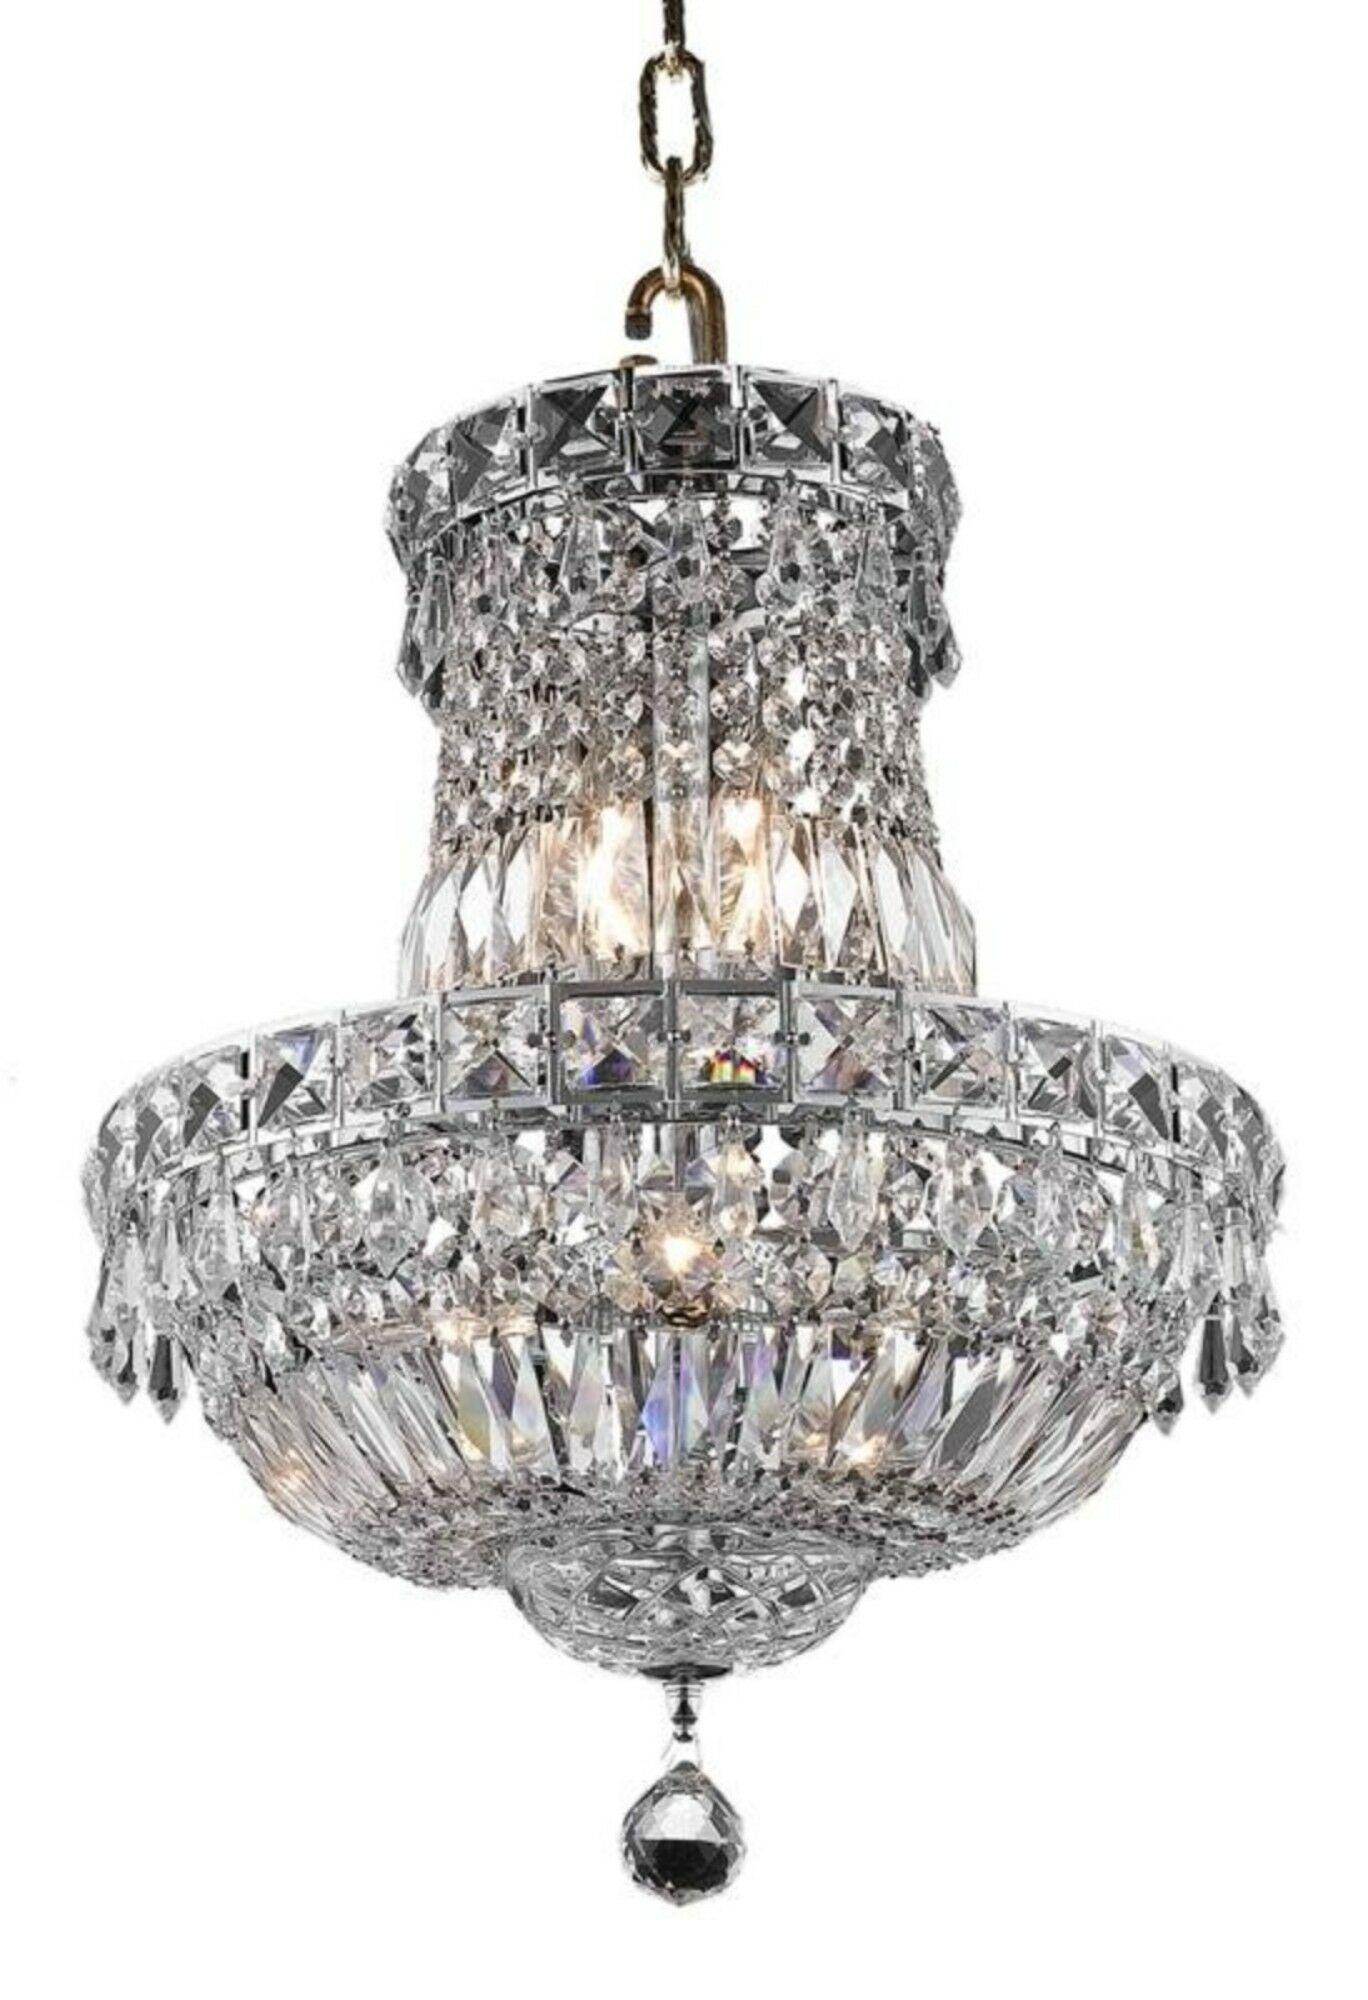 Fulham 6-Light Empire Chandelier Finish: Chrome, Crystal: Elegant Cut